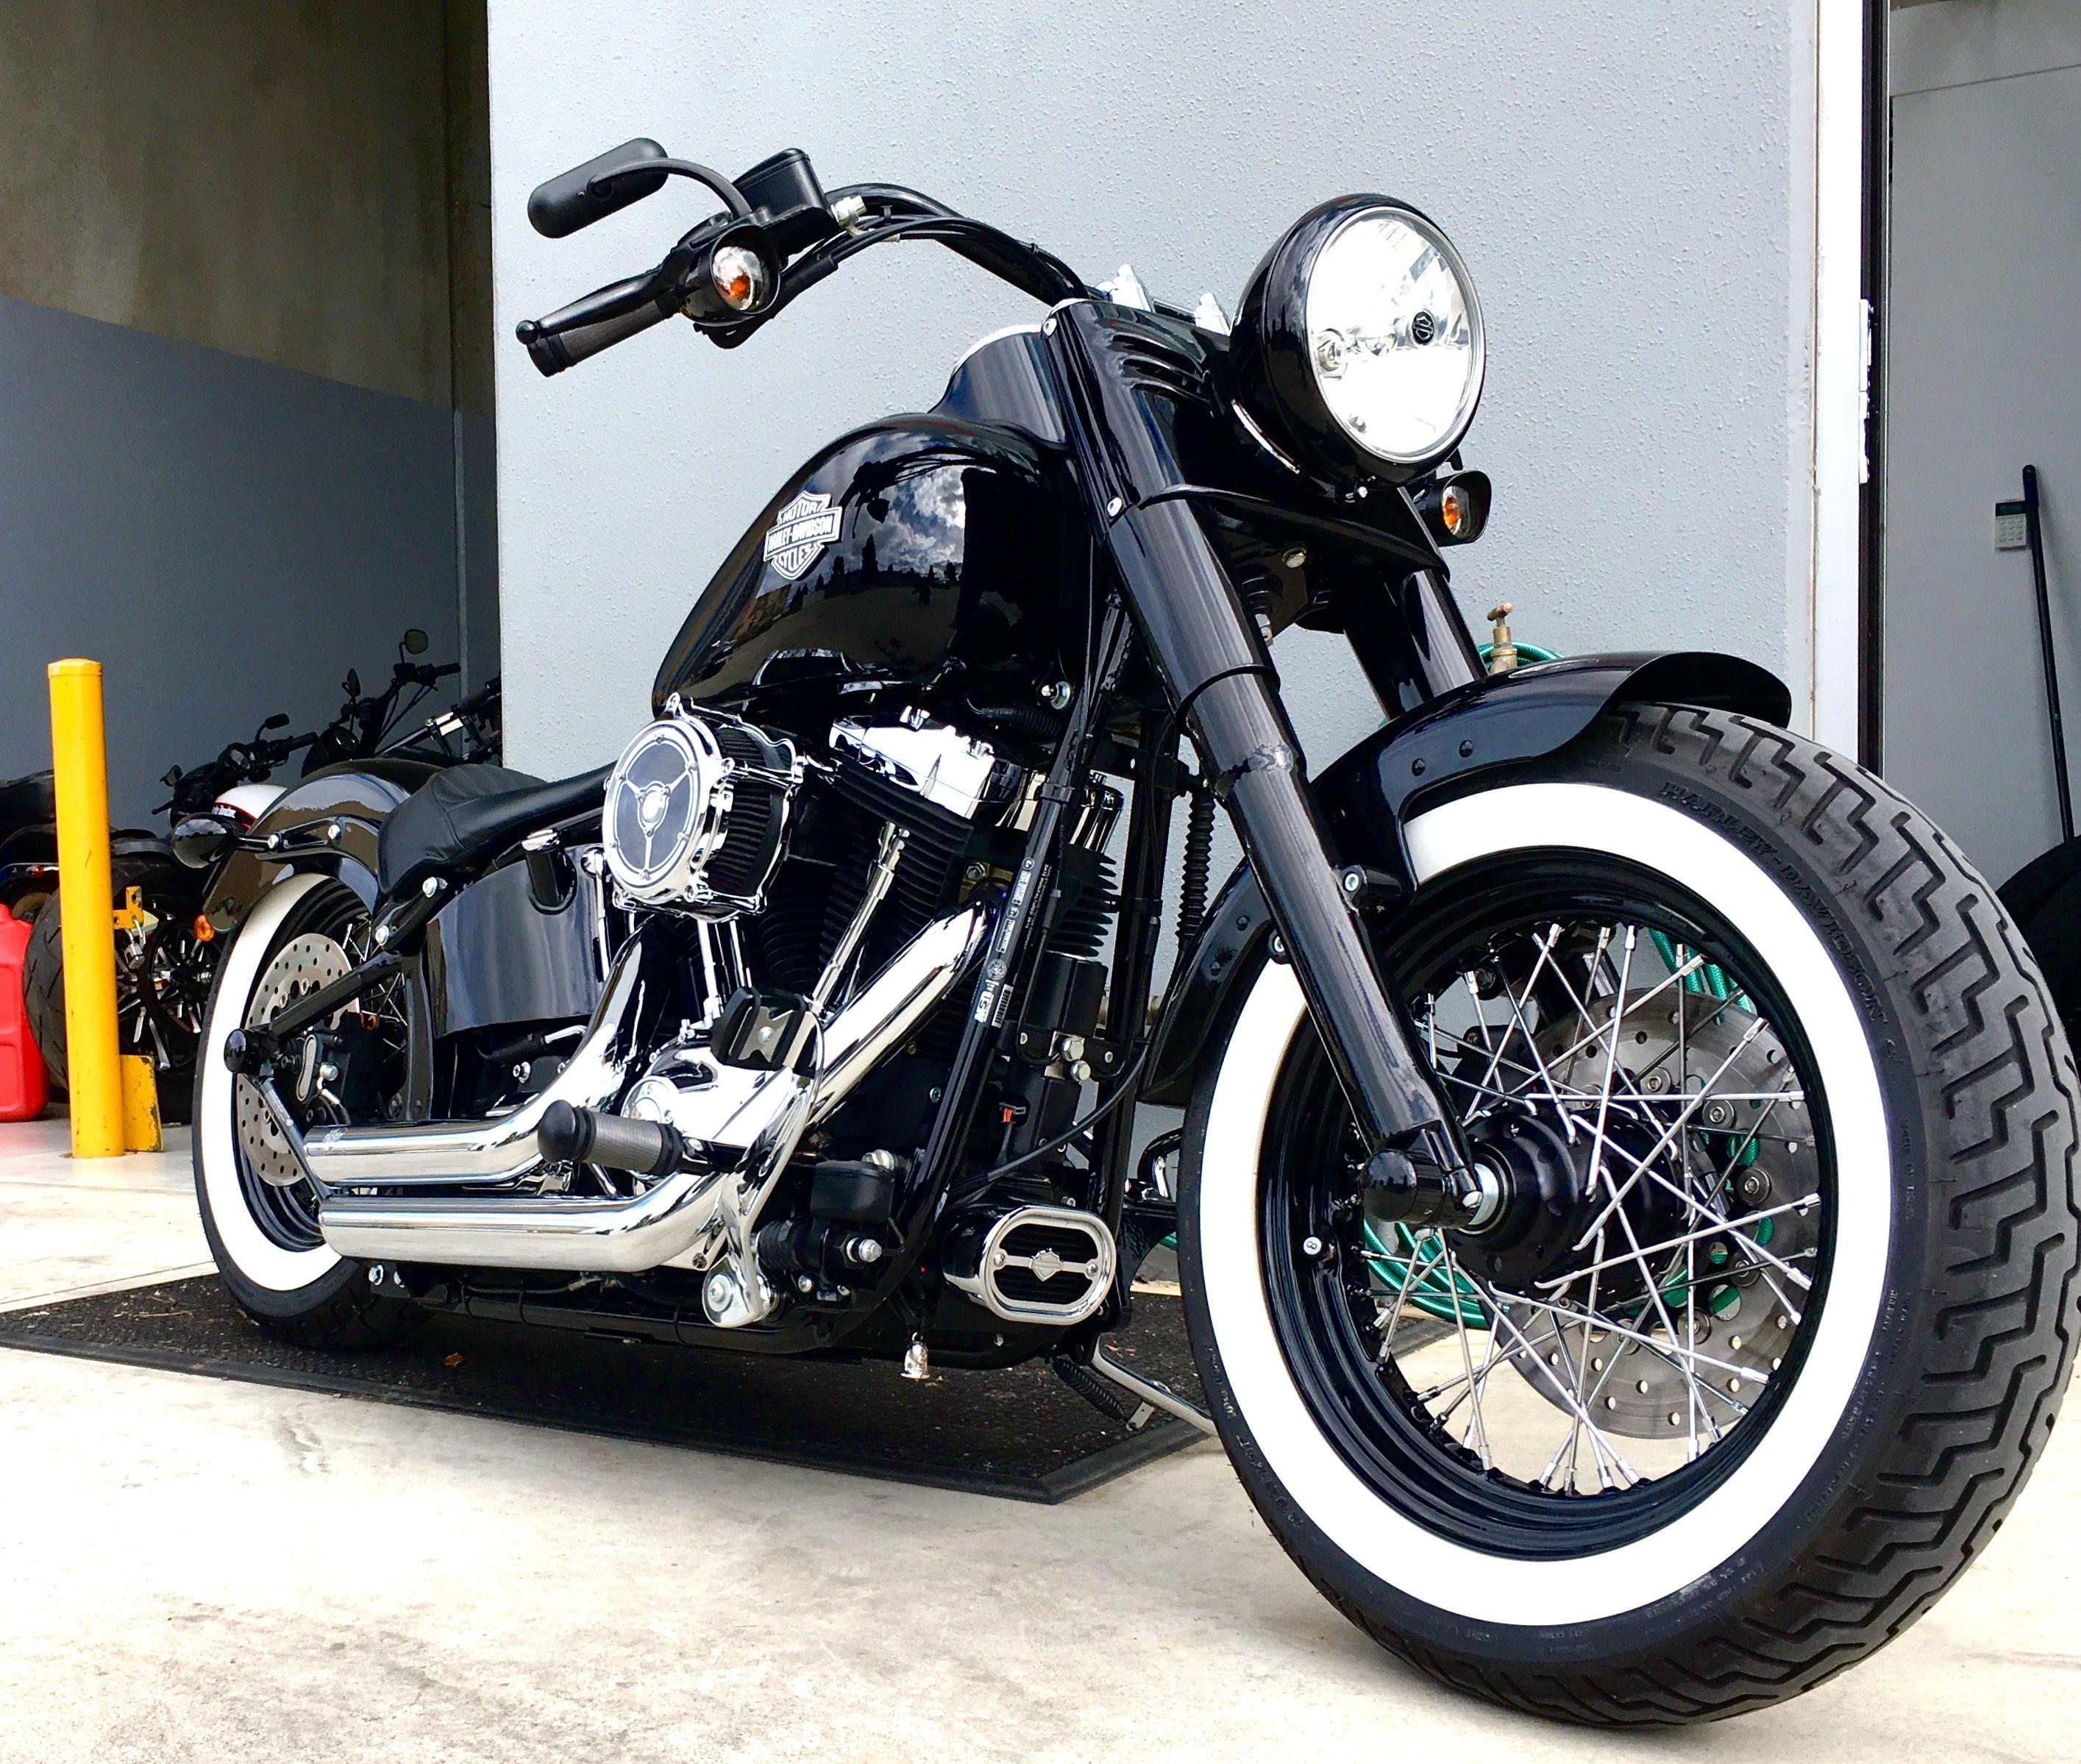 AA Custom Cycles Classic harley davidson, Harley